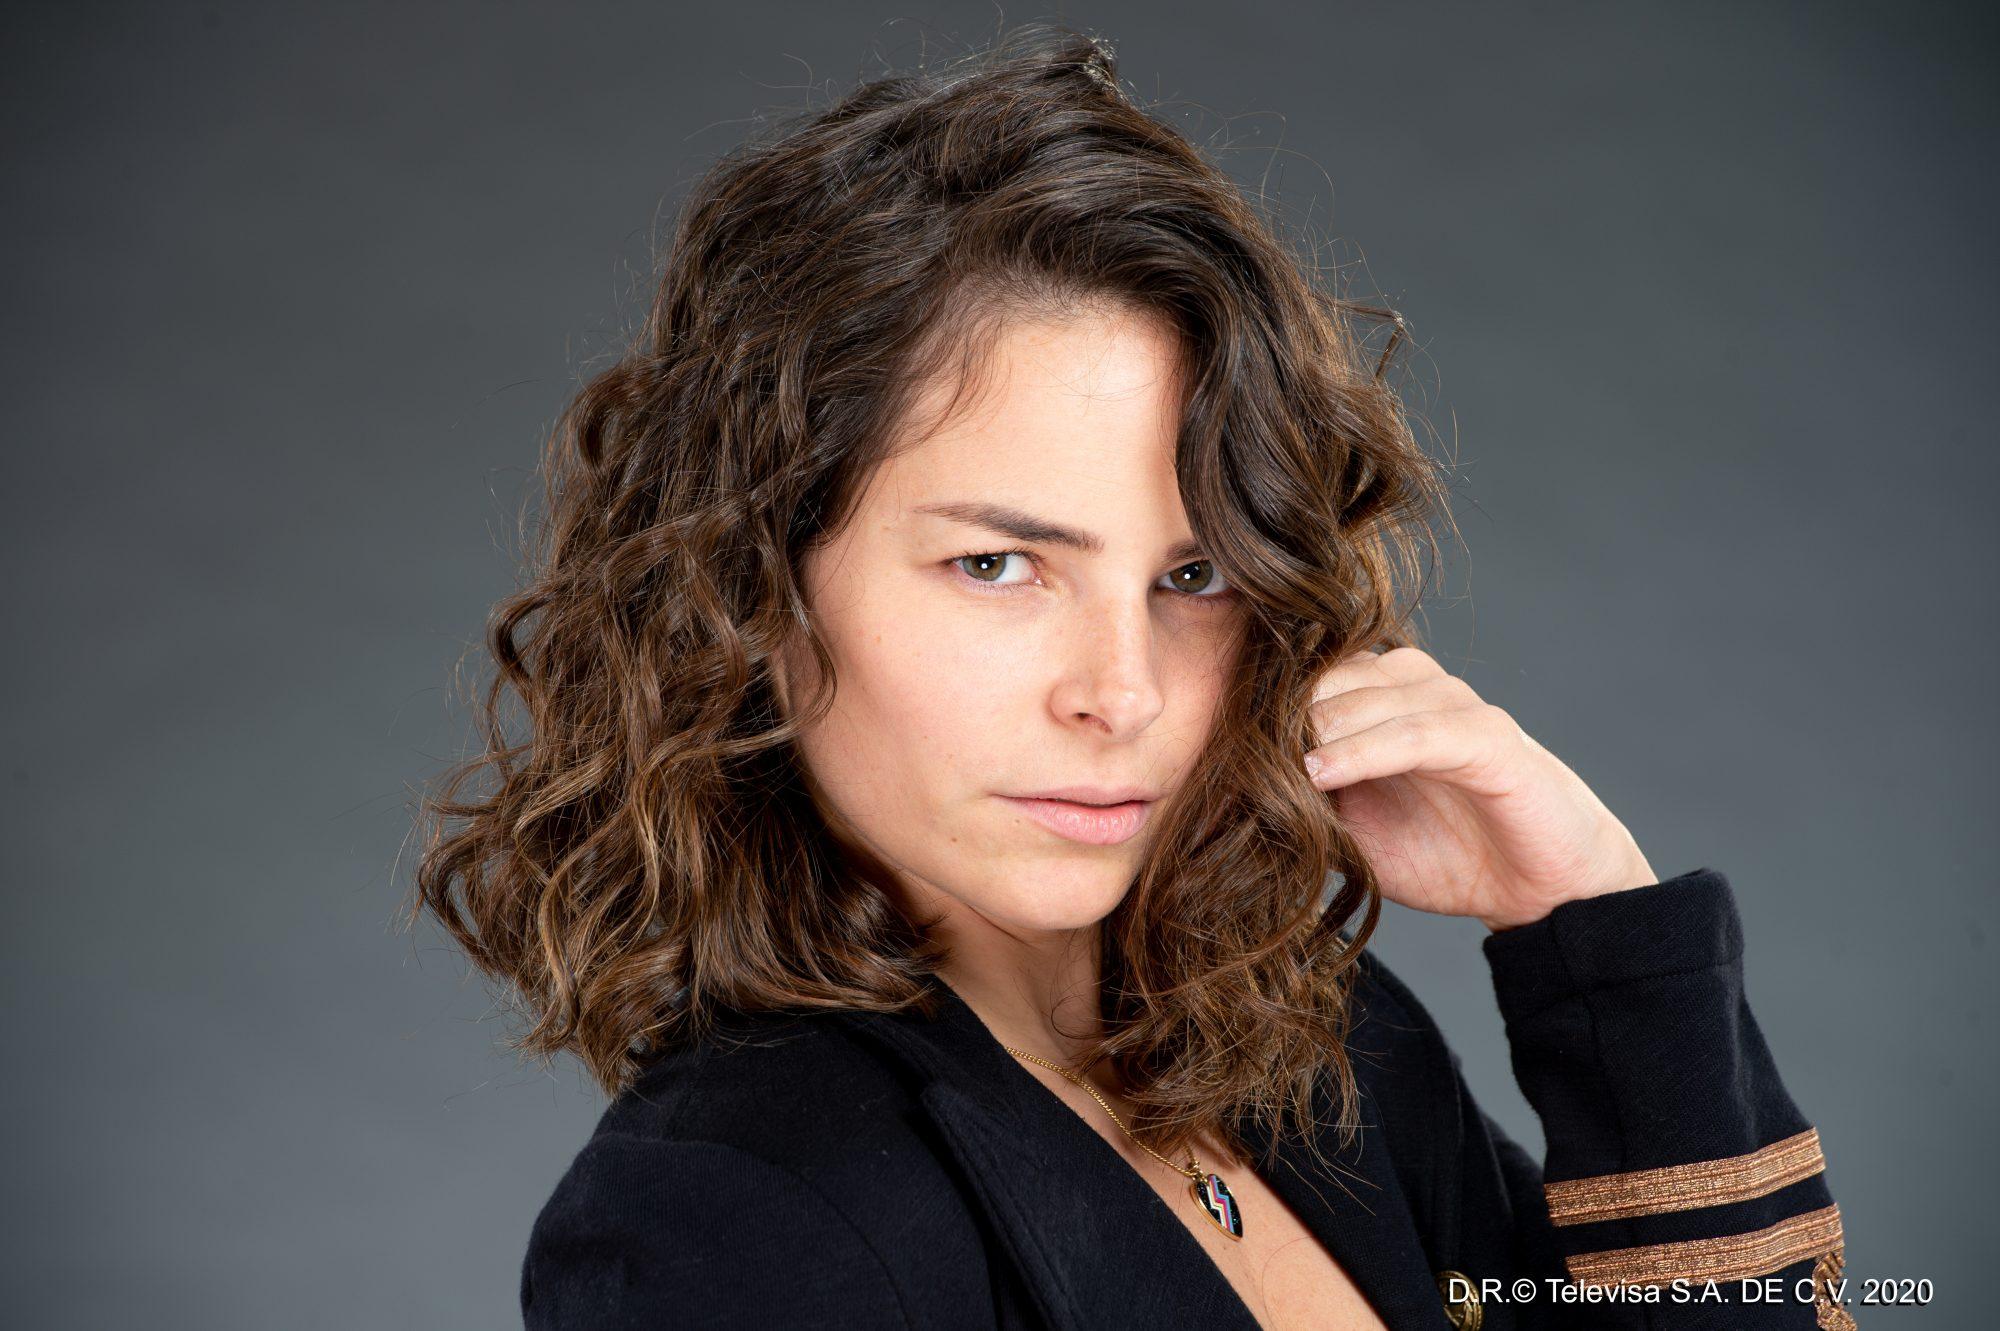 Alejandra Robles Gil